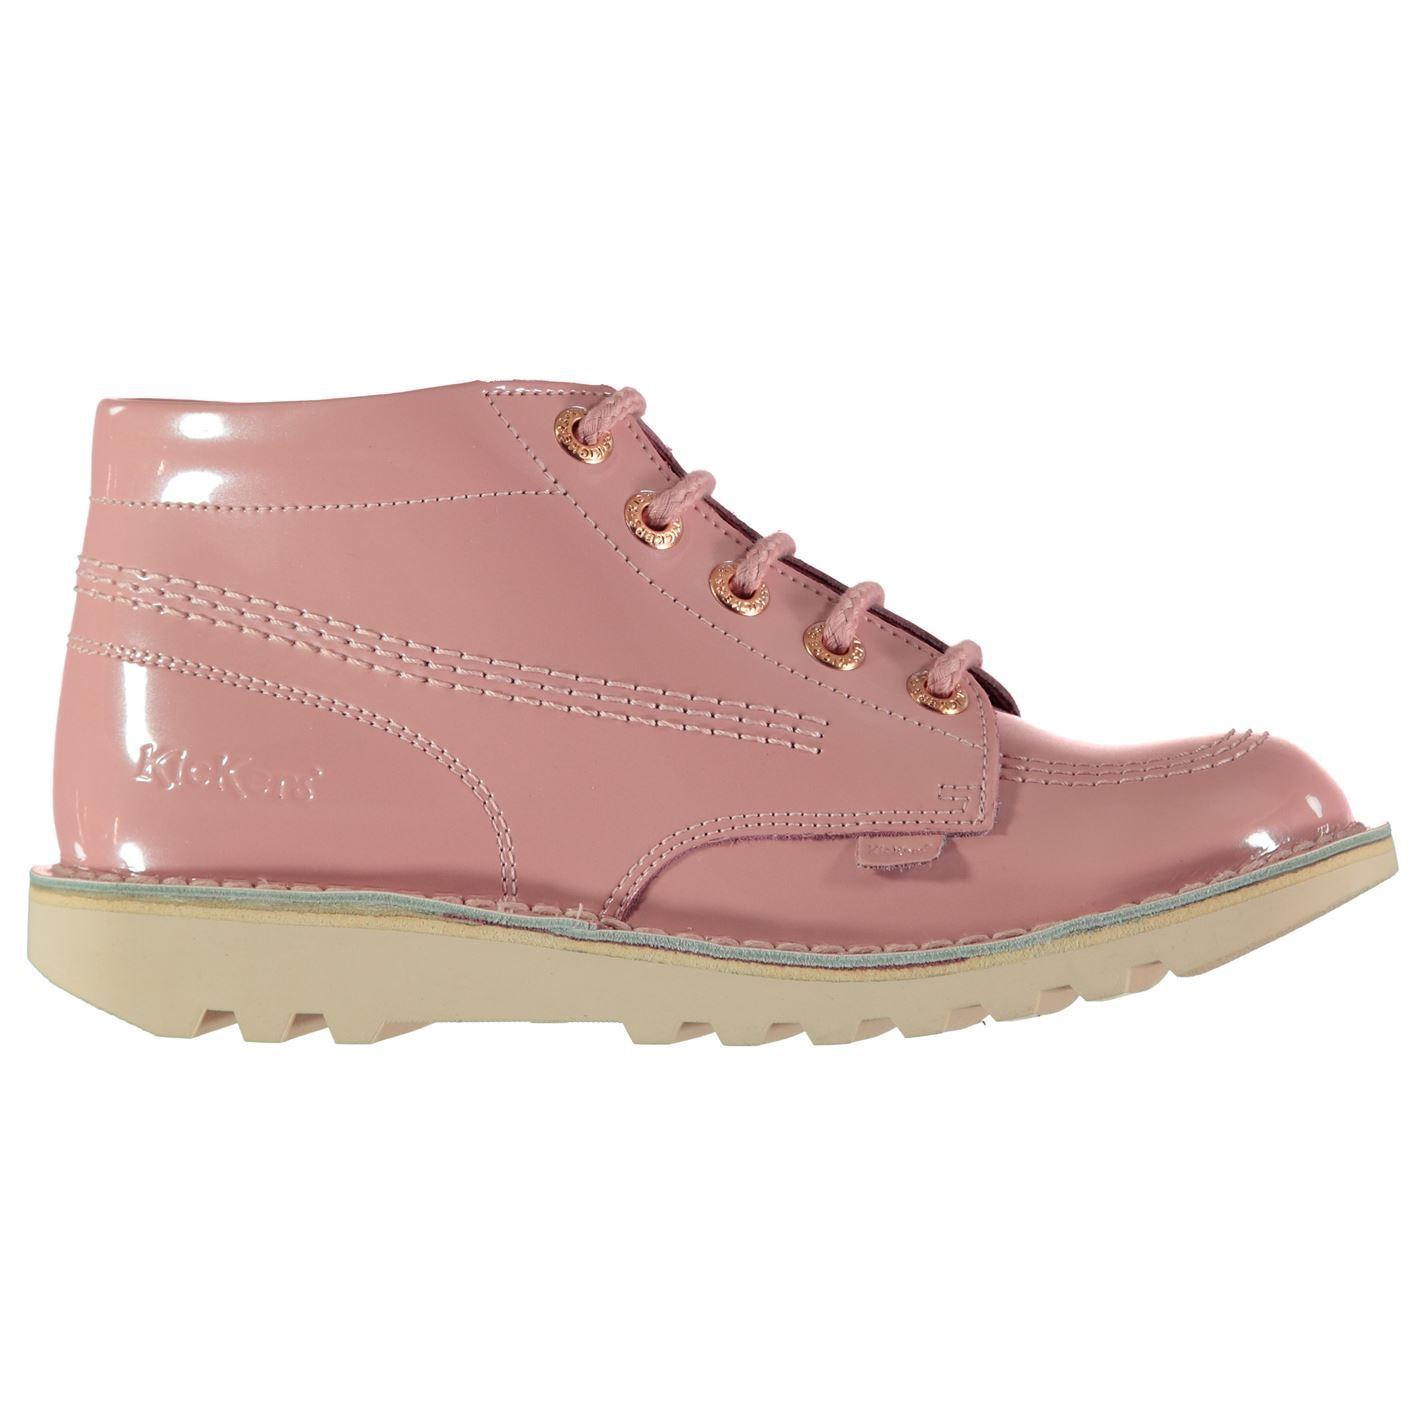 Kickers Leder Damenschuhe Hi Leder Kickers Schuhes Lace Up Upper 7296d8